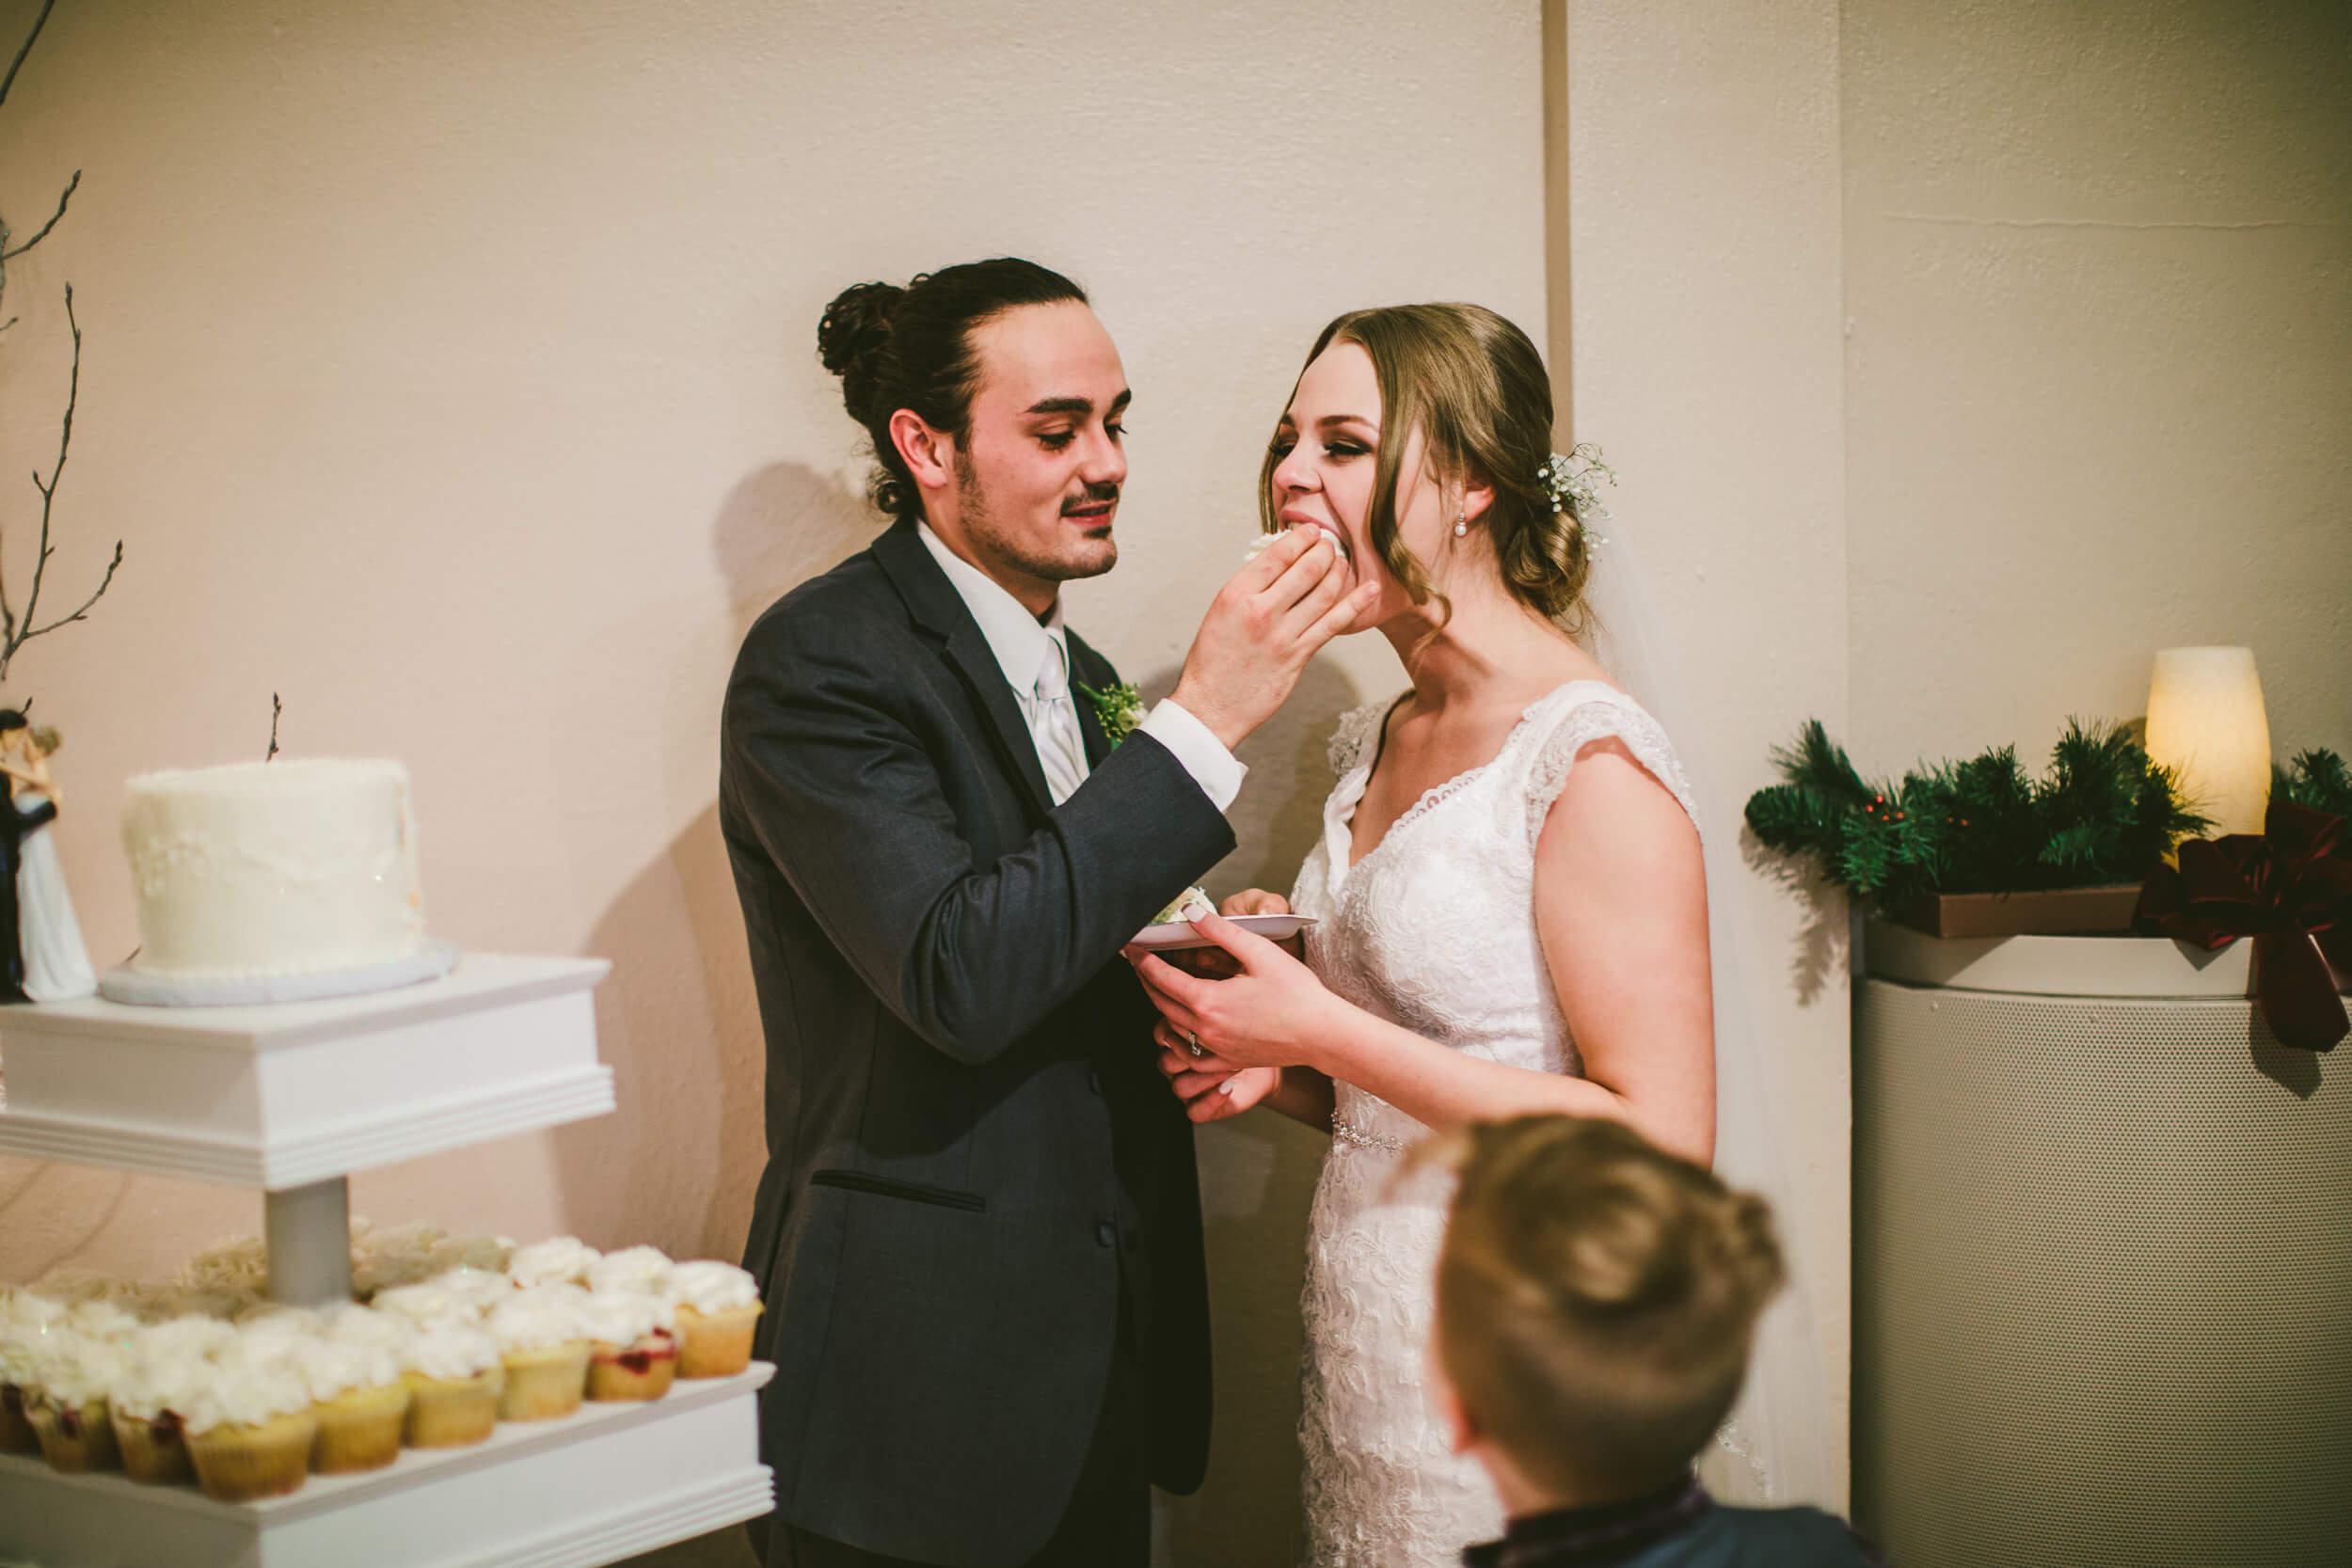 mukogawa winter wedding in spokane (315).jpg